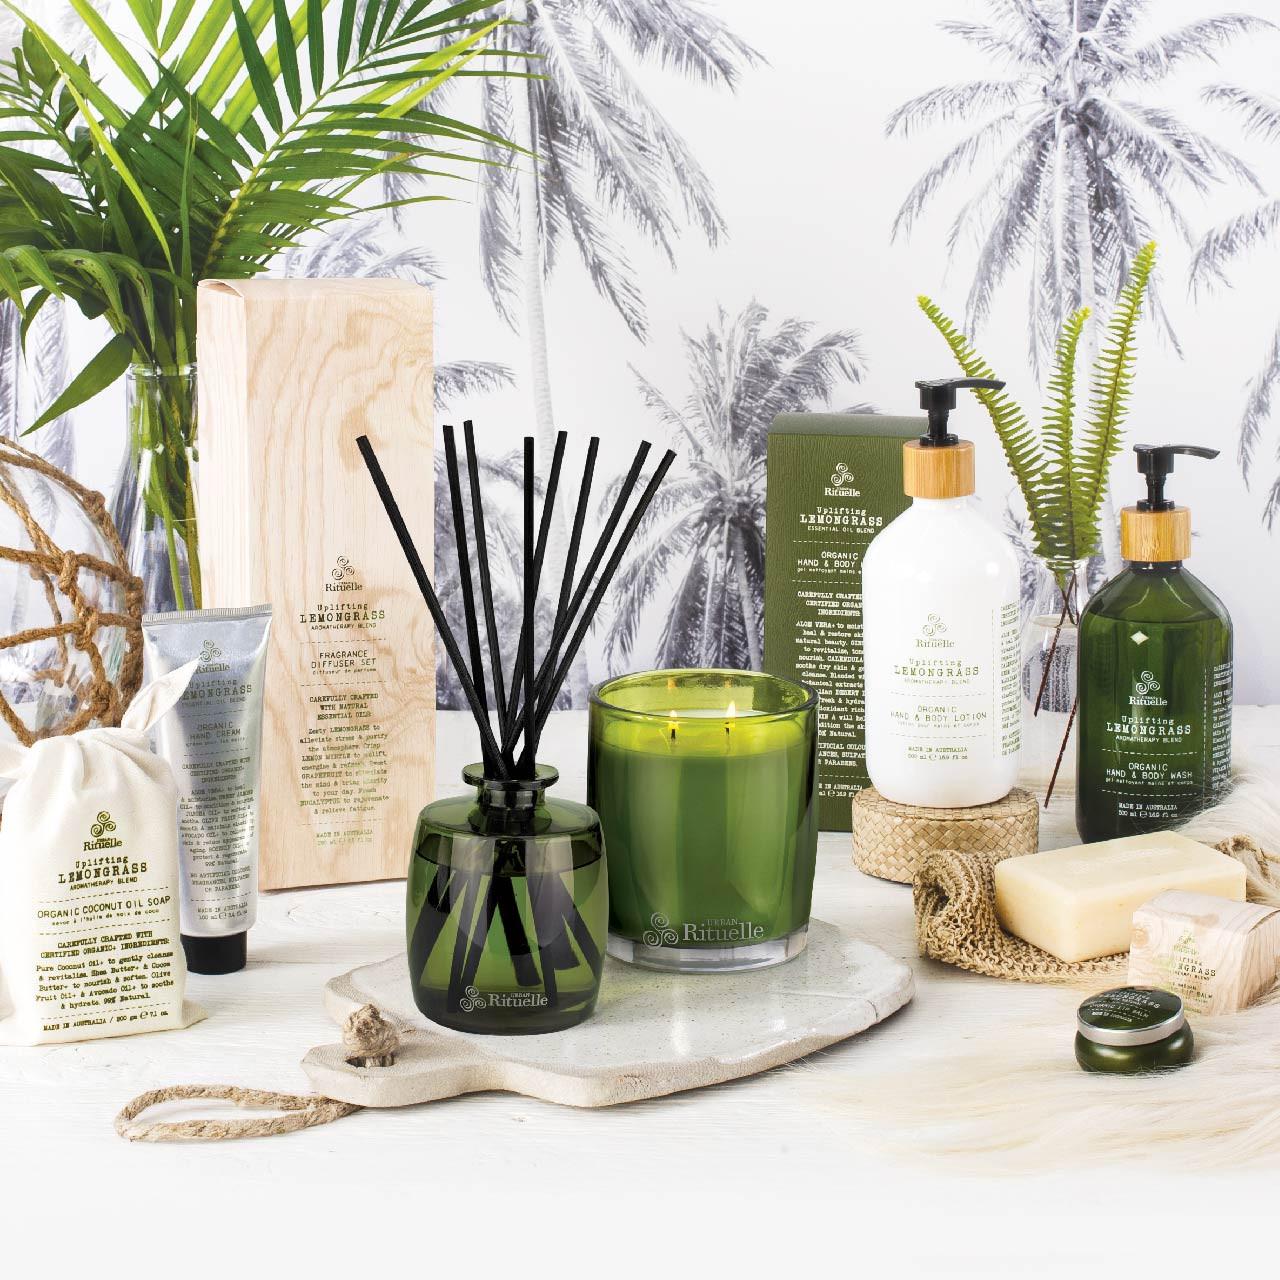 Flourish Organics - Fragrance Diffuser Set - Lemongrass - Urban Rituelle